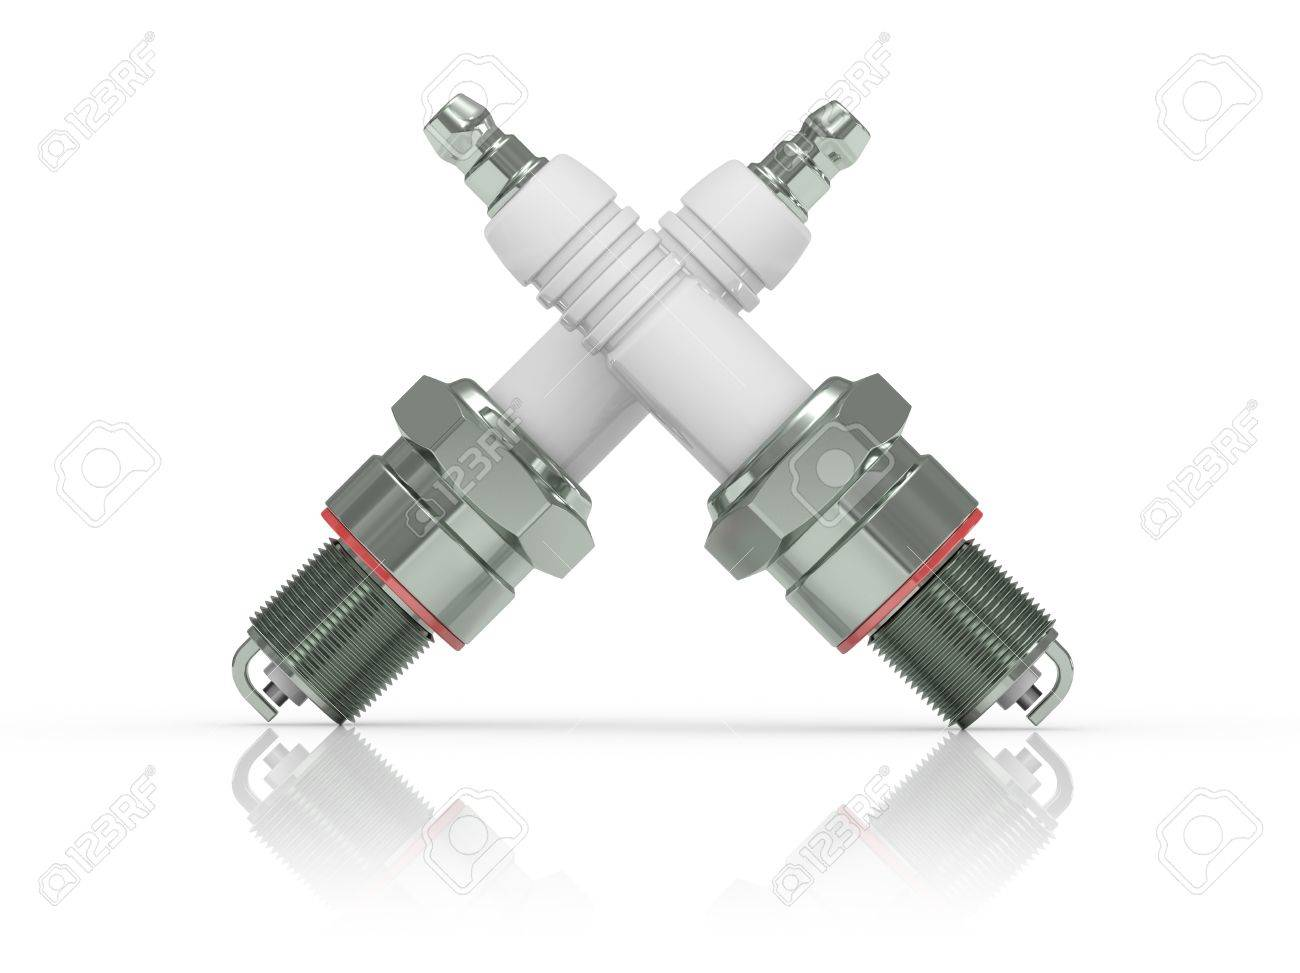 3d illustration. Spark Plug on white background. Stock Photo - 7788007